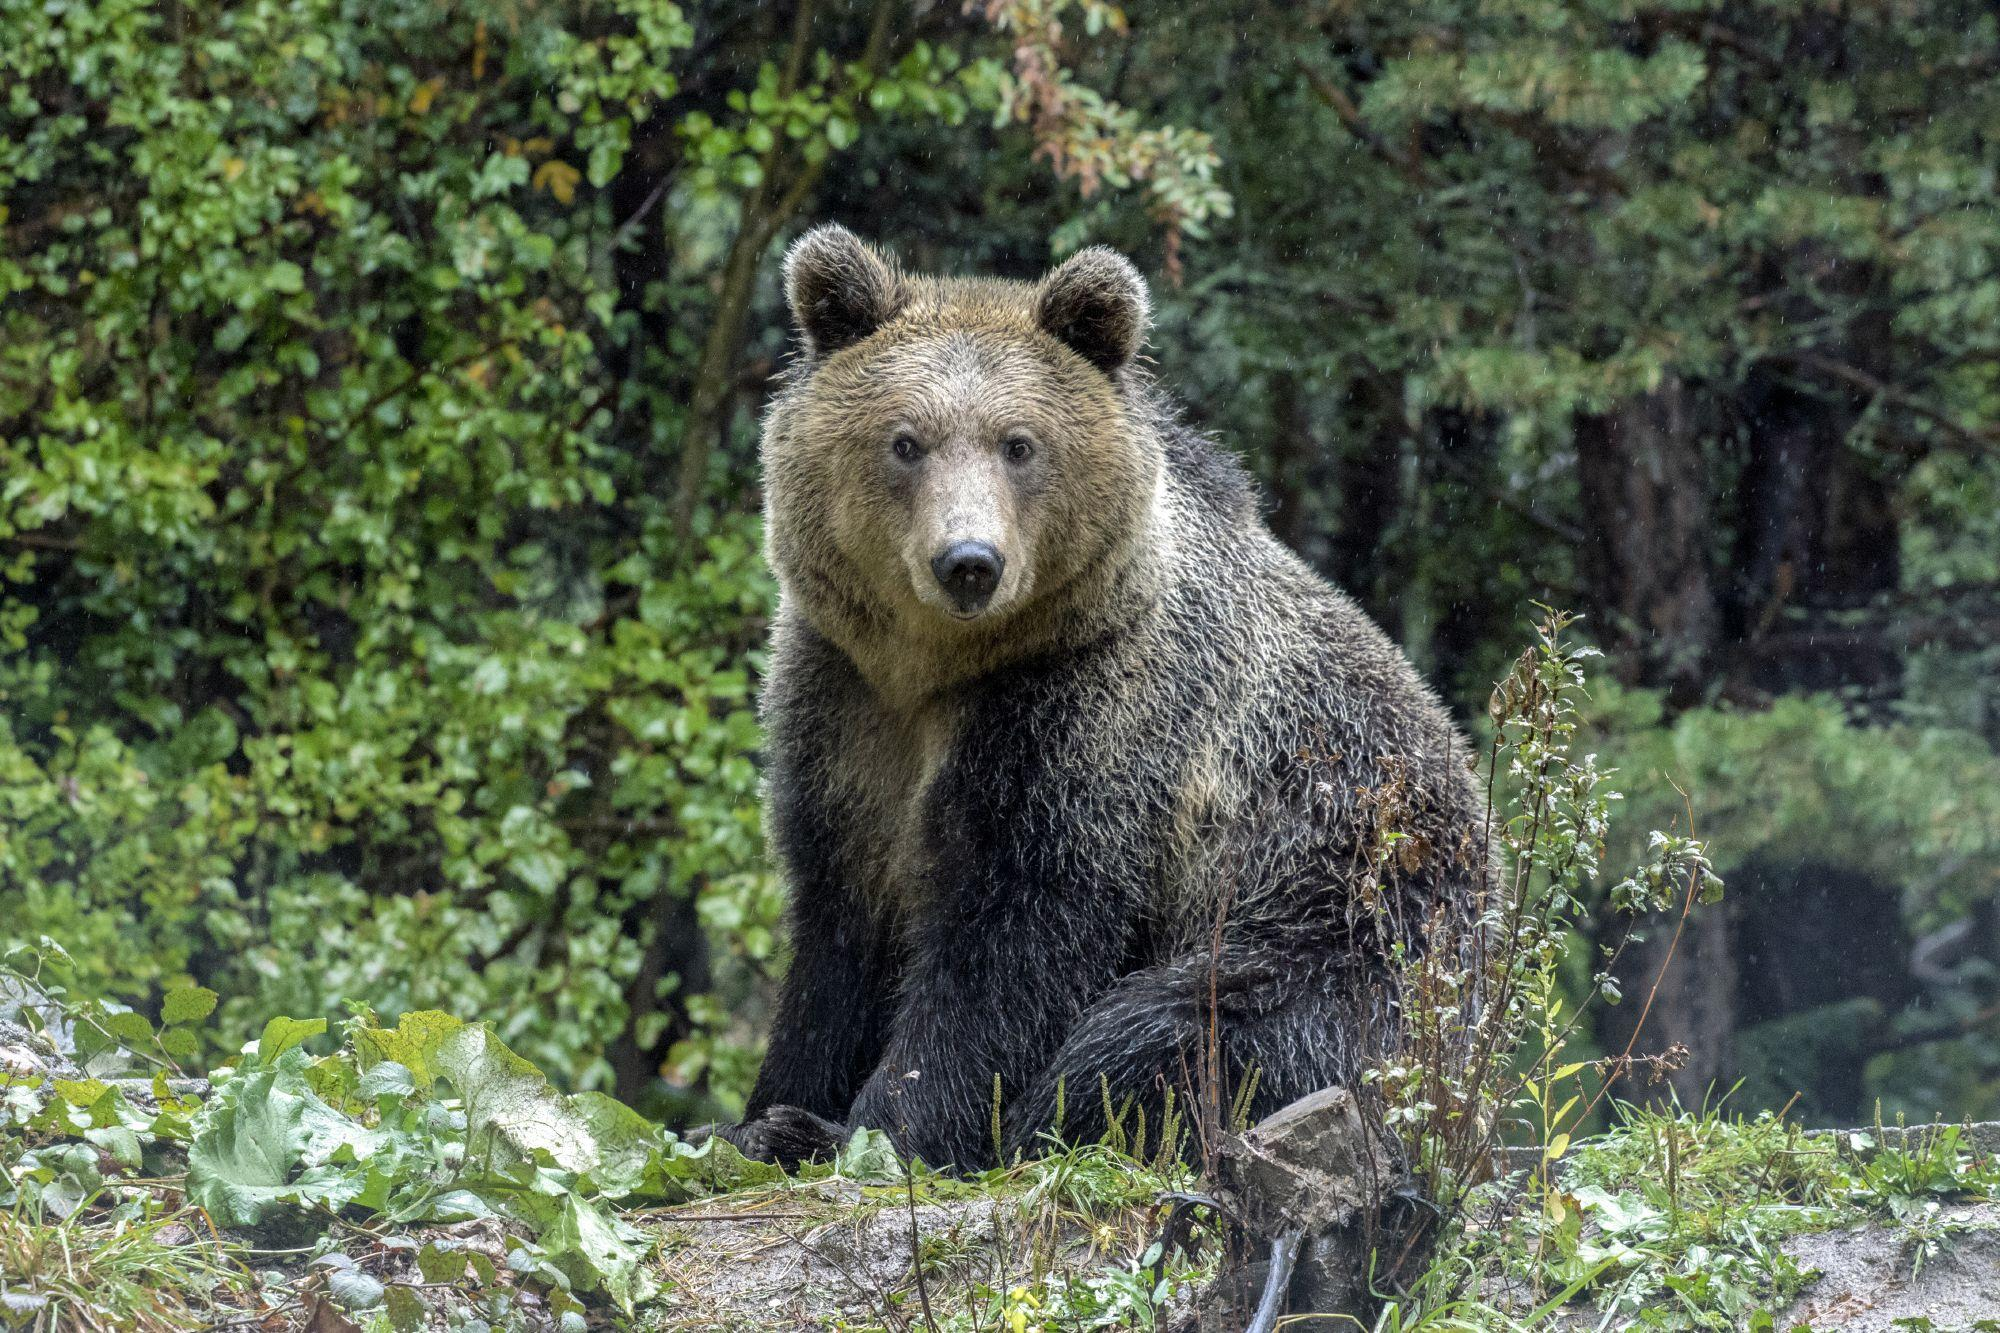 Bear in sanctuary